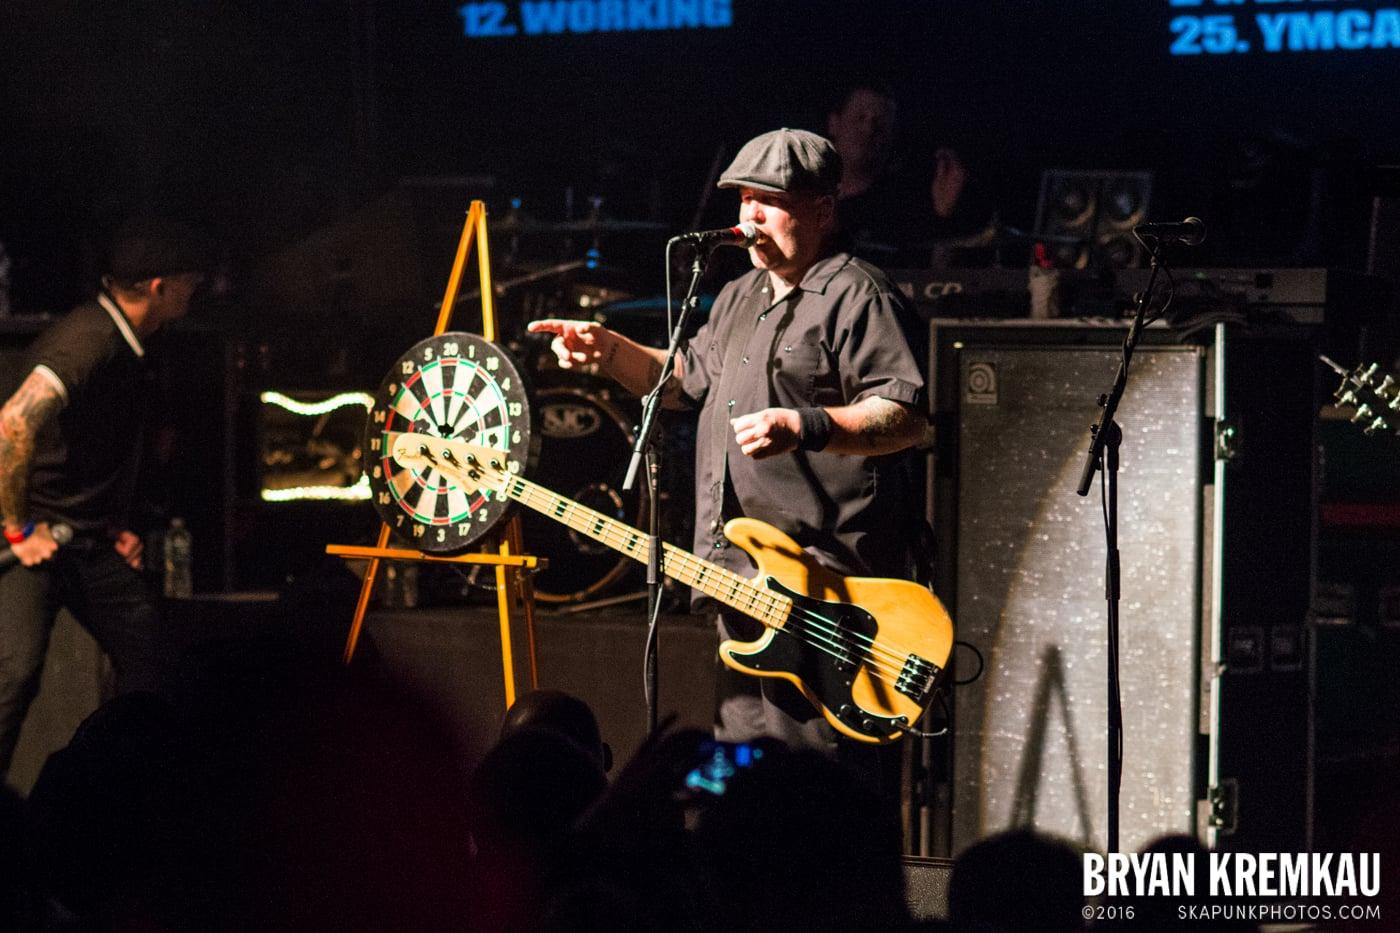 The Dropkick Murphys @ Irving Plaza, NYC - 3.9.15 (9)